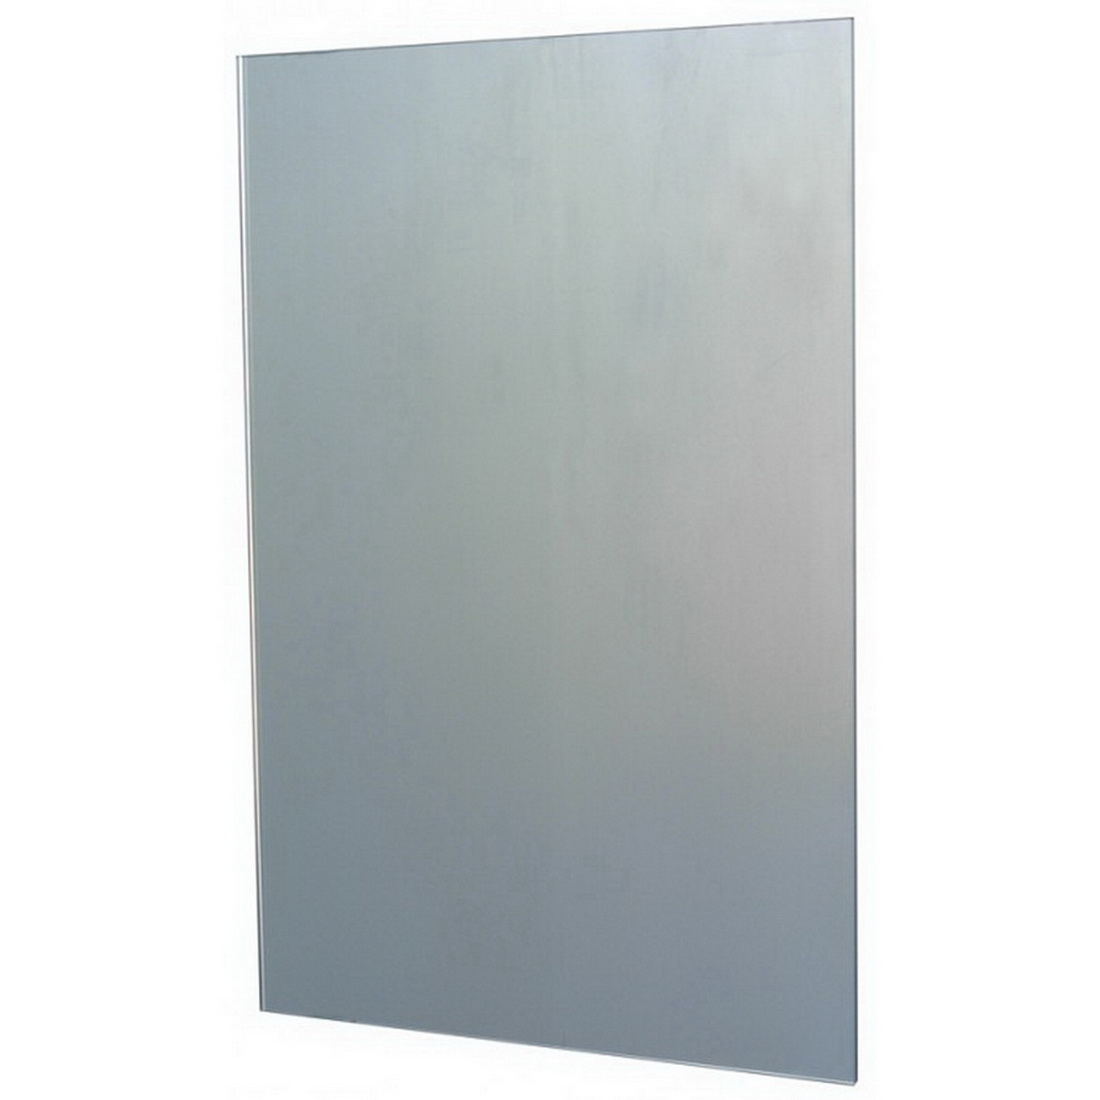 Styline Polished Edge Mirror 900 x 750mm 9X75STYLE